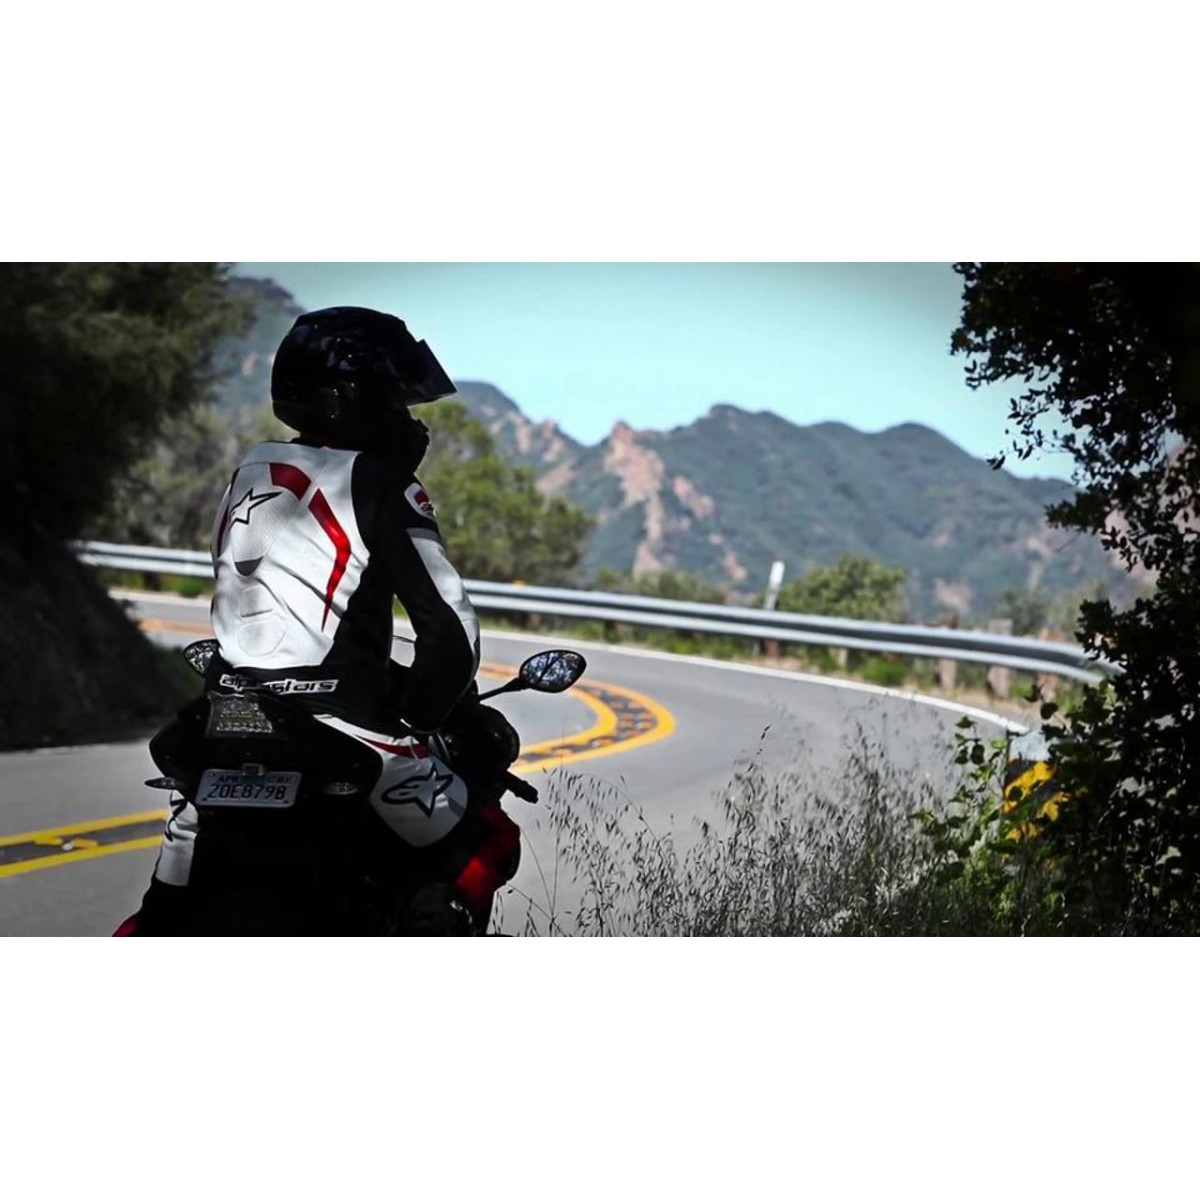 Macacão Alpinestars Motegi 2 pçs - Branco/Preto/Vermelho  - Super Bike - Loja Oficial Alpinestars